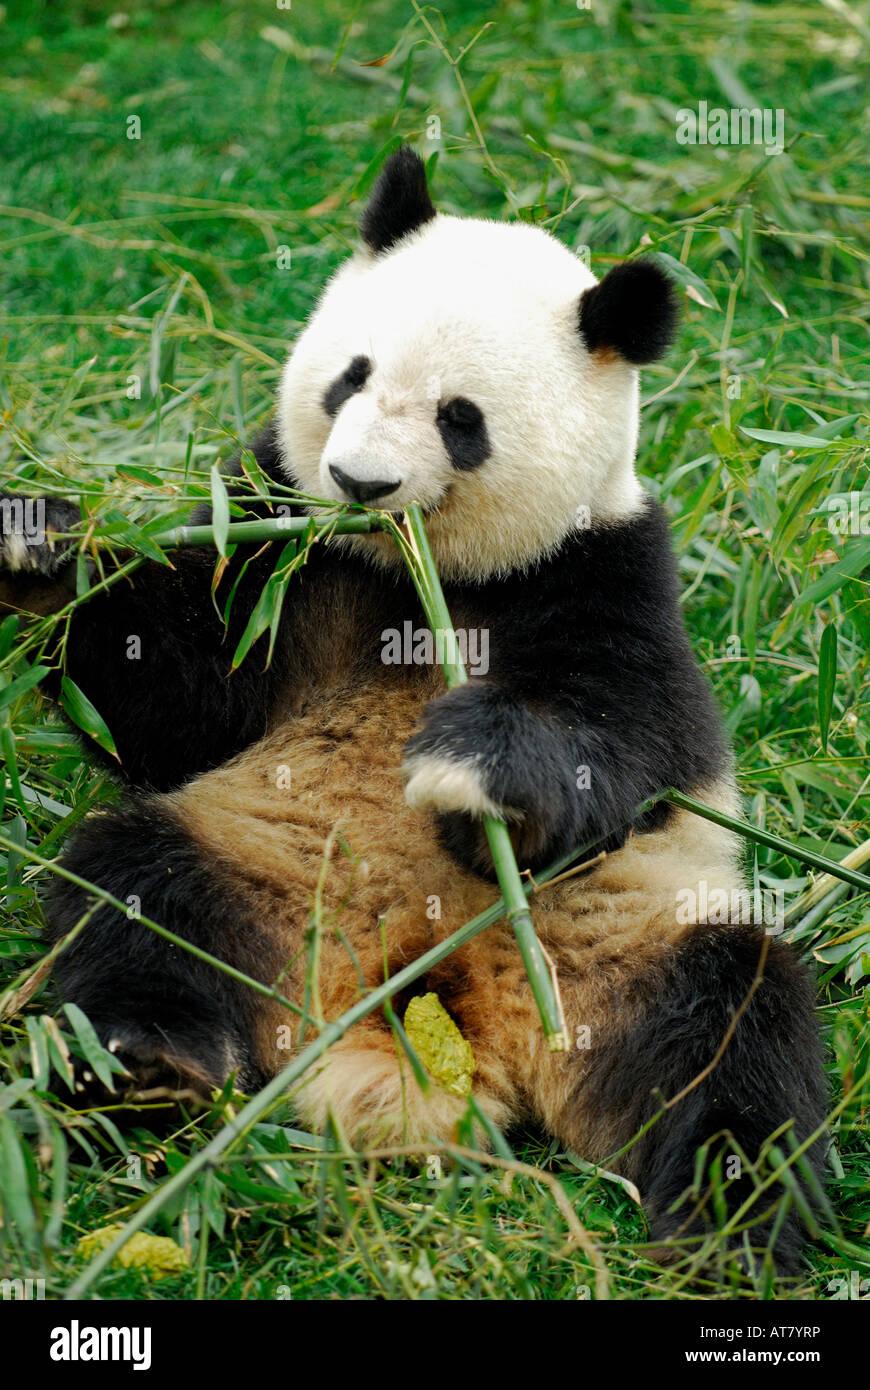 Giant Panda feeding on bamboo shoot at Chengdu Research Base of Giant Panda Breeding Sichuan China - Stock Image